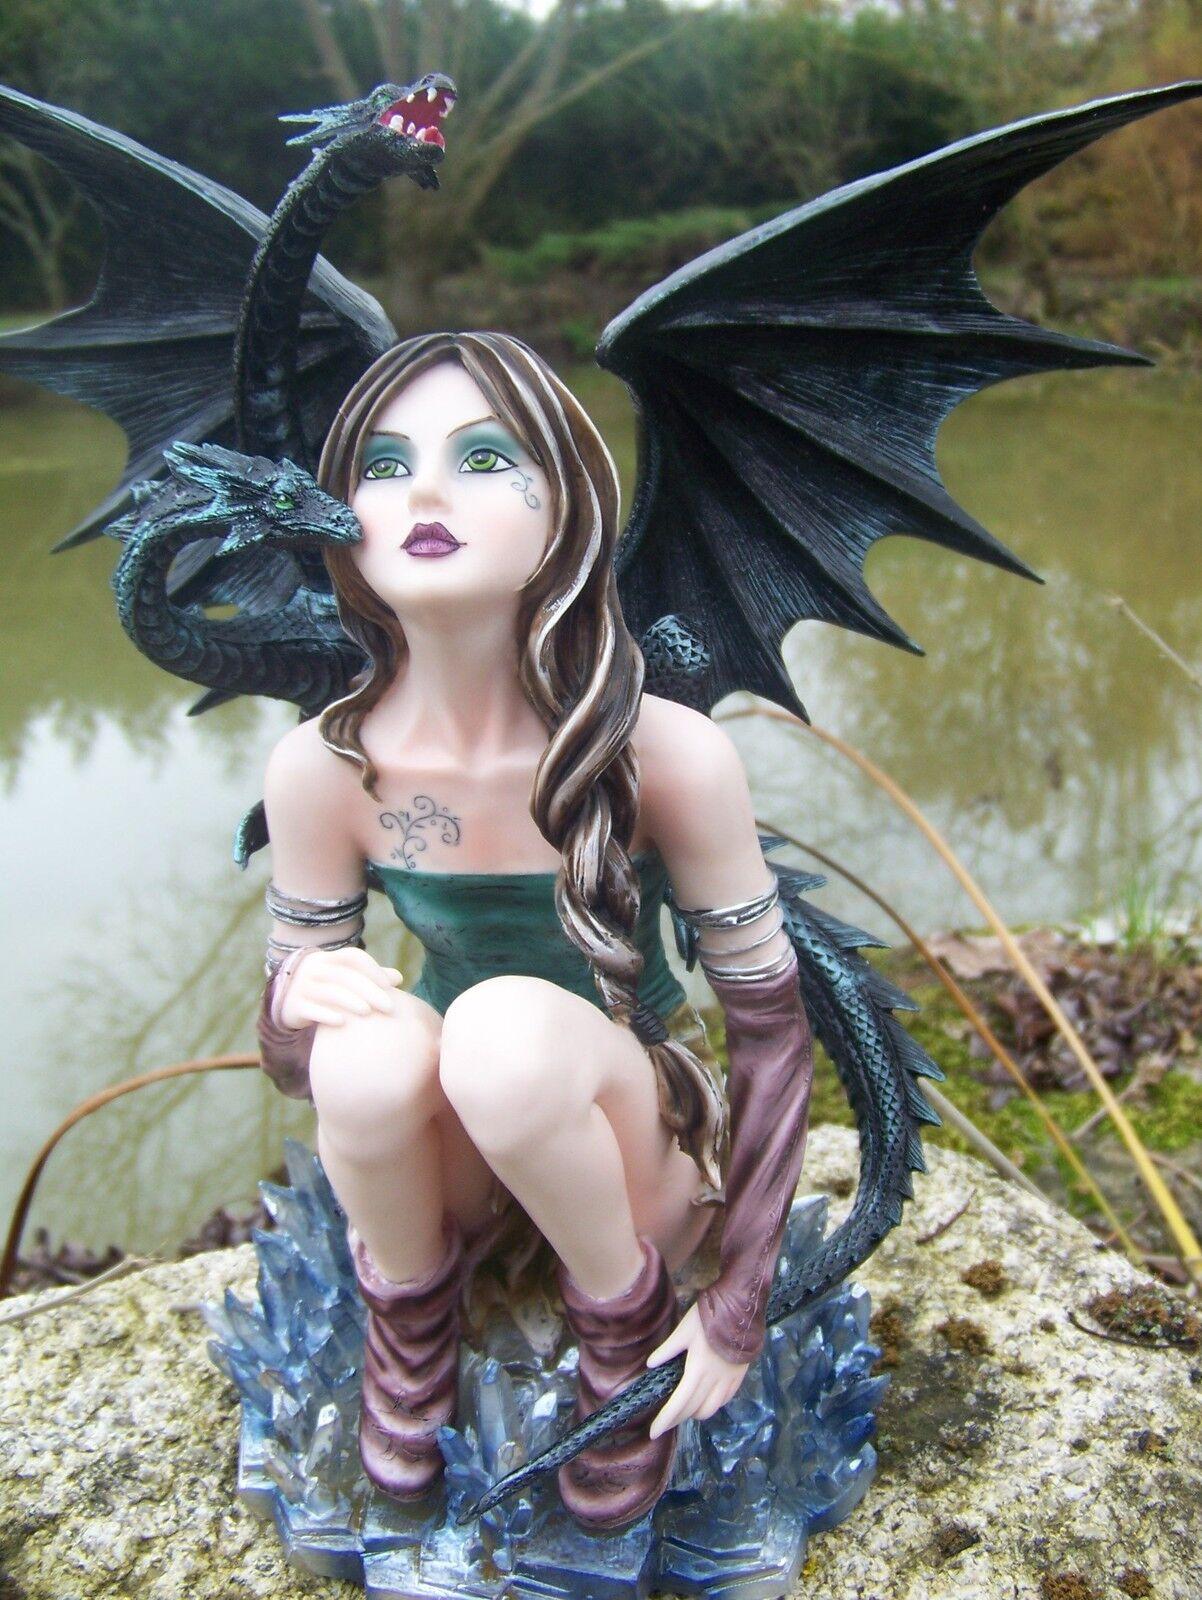 15246 grand statuette figurine fee fairy heroic fantasy  gm dragon fees  nous prenons les clients comme notre dieu